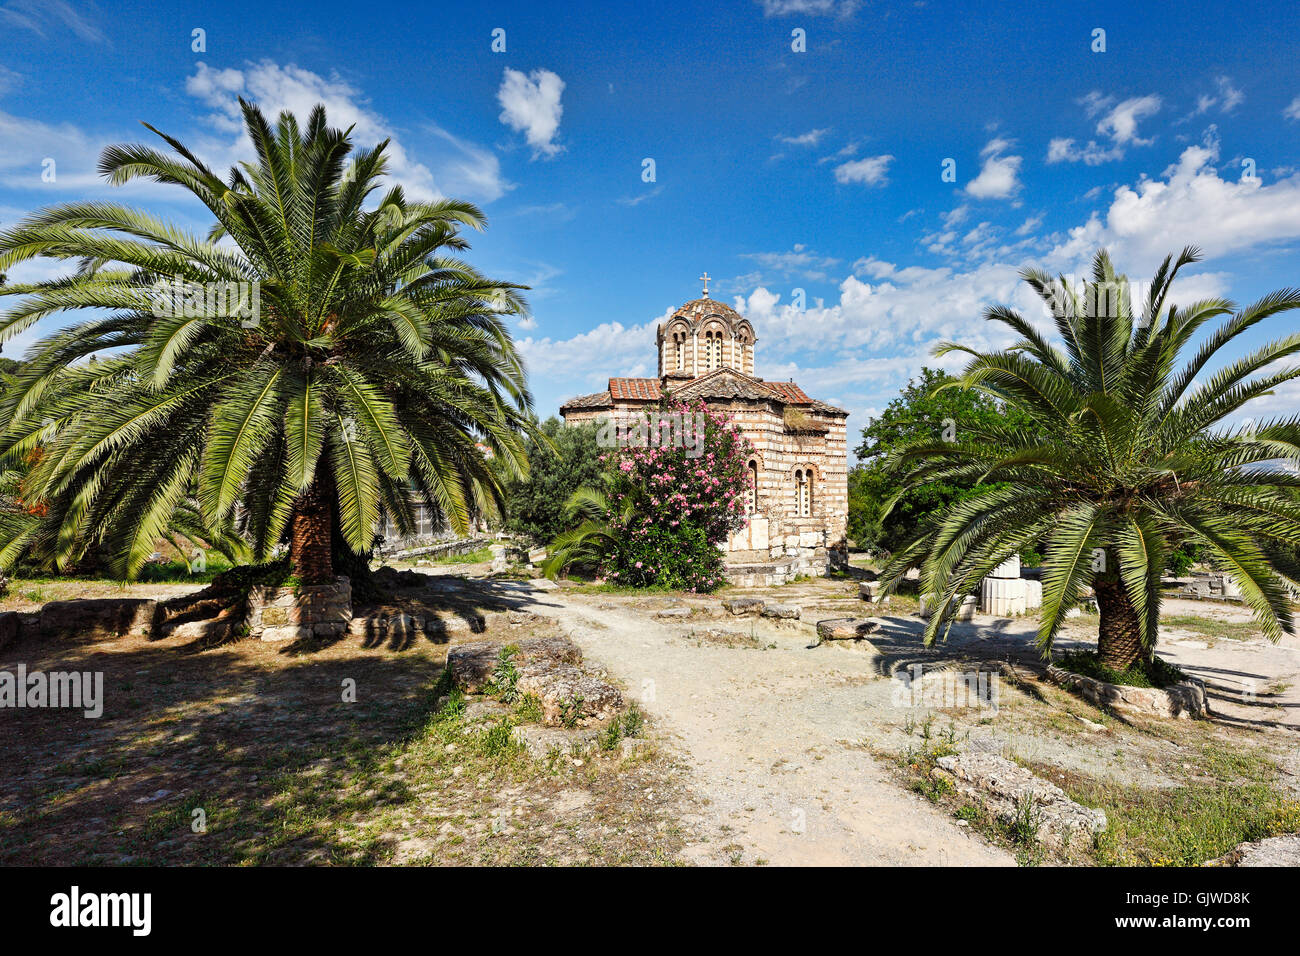 Agii Apostoli Solaki iglesia (10c. A.D.) en la antigua Ágora ateniense, Grecia Imagen De Stock